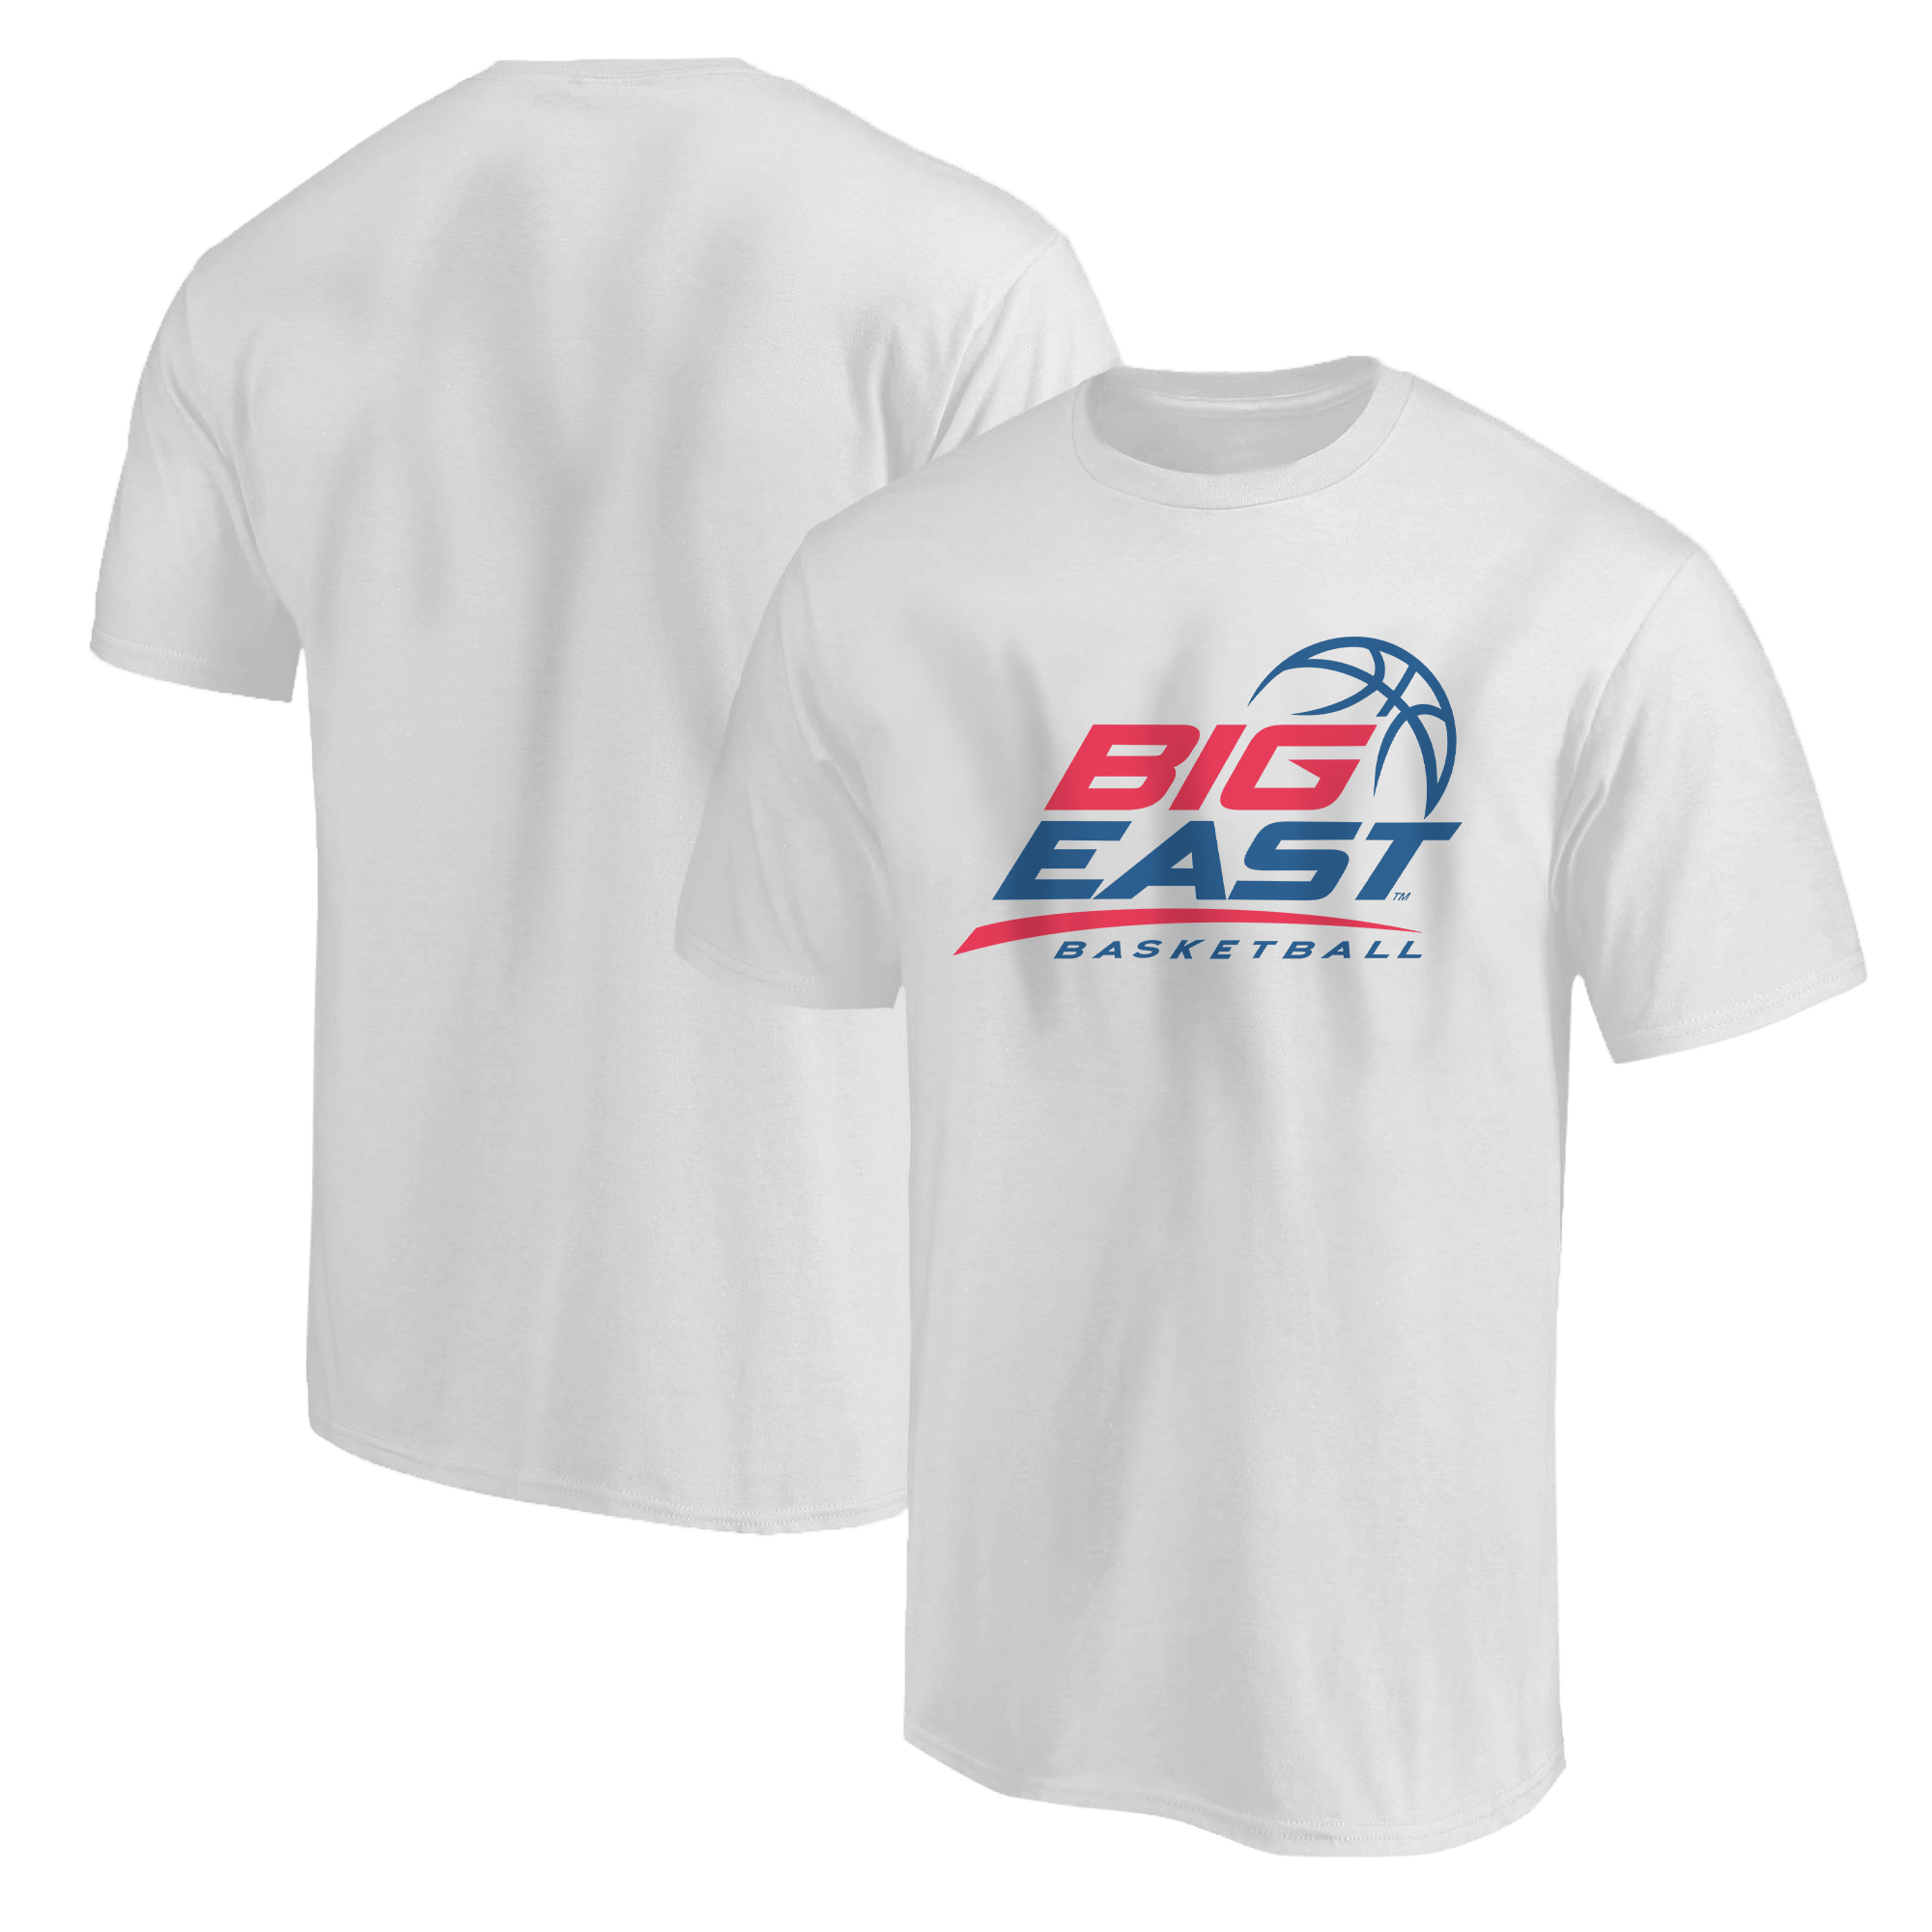 Big East Basketball Tshirt (TSH-WHT-ncaa-NP-bigeast-651)